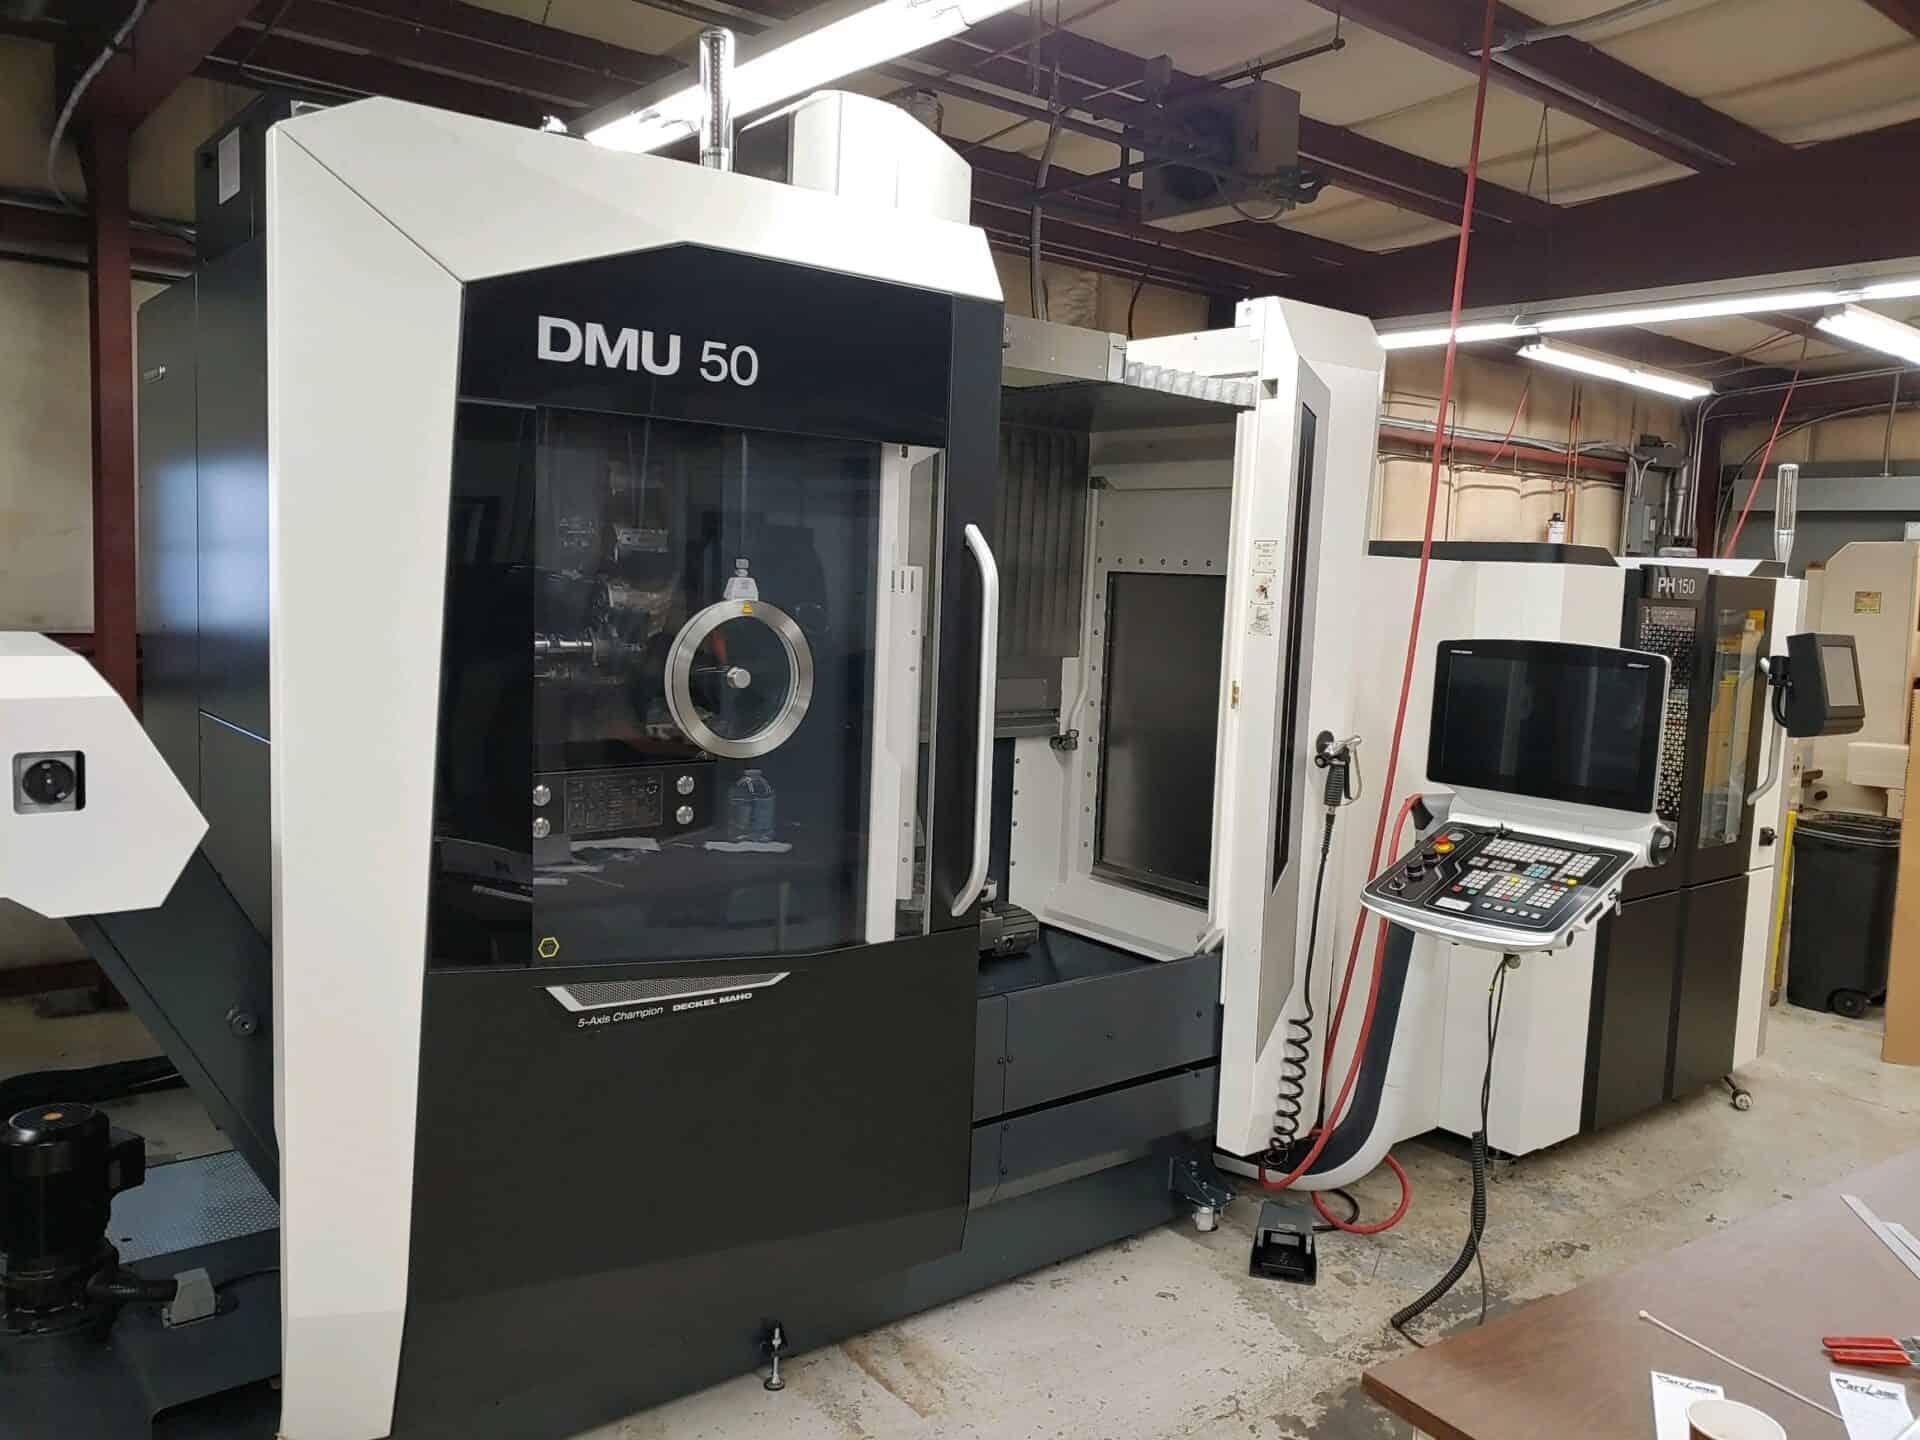 2020 DMG Mori DMU 50